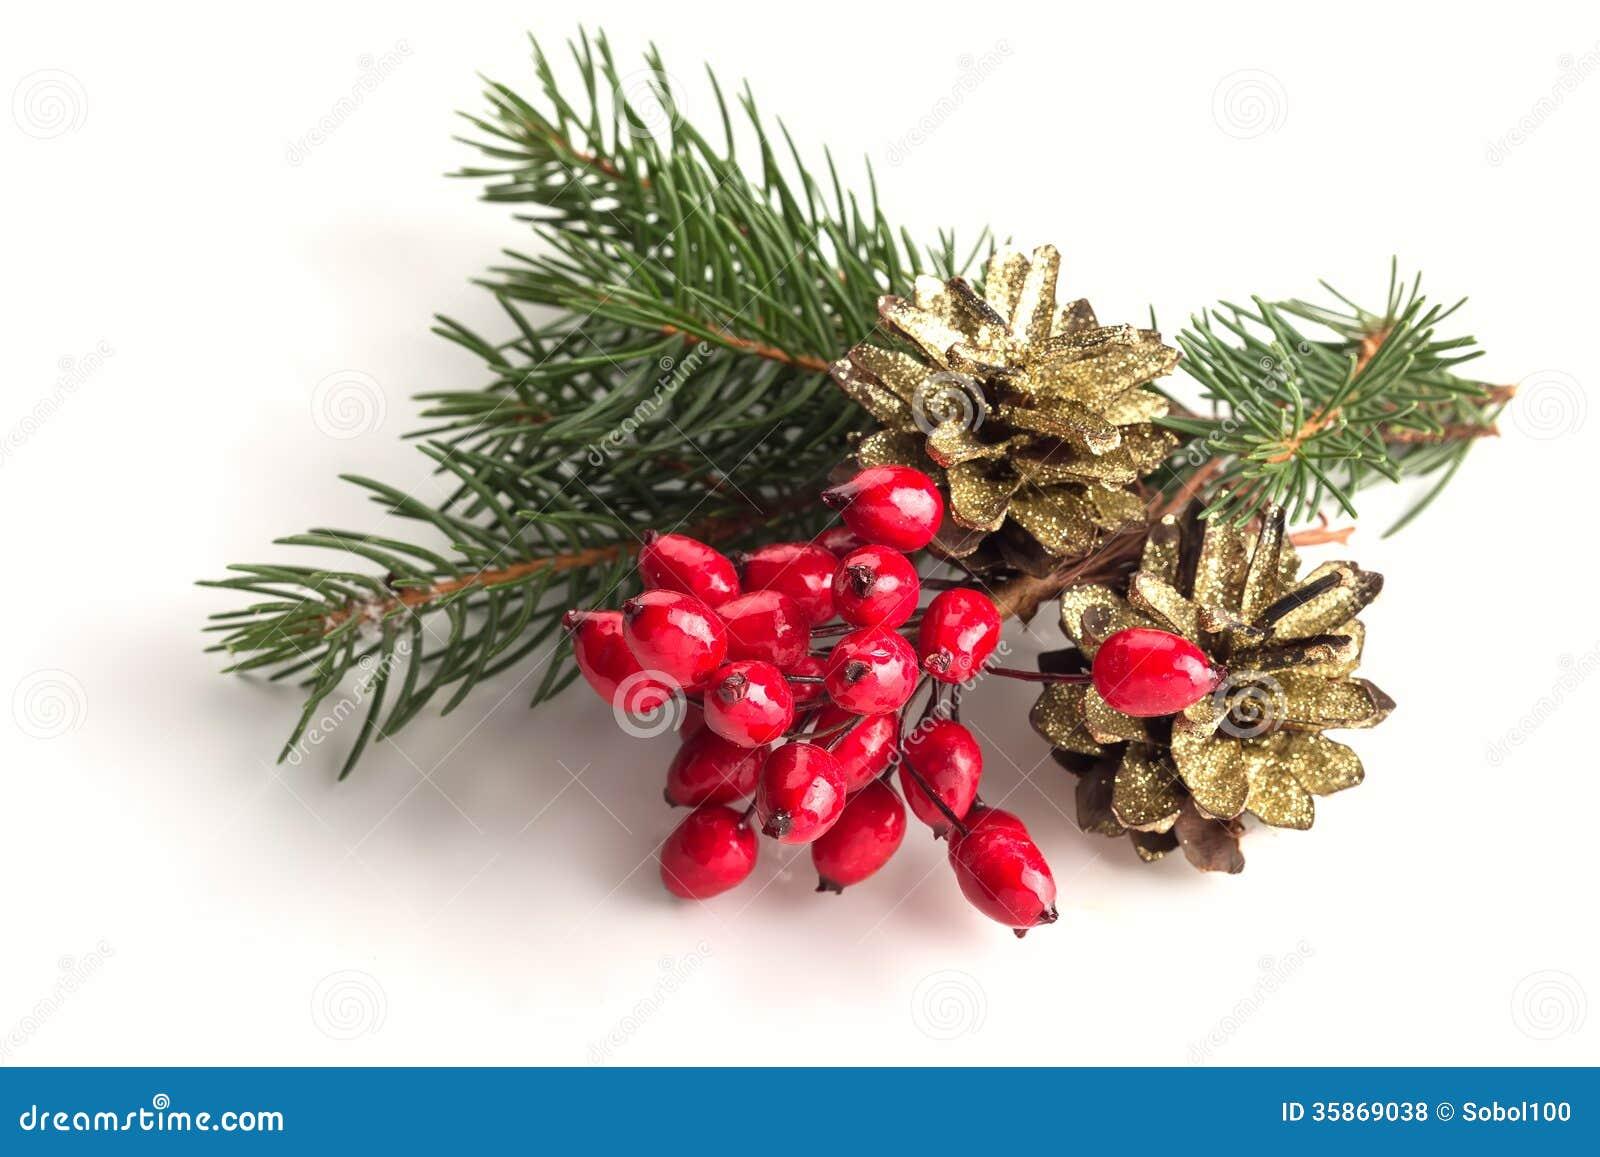 Spruce, Berries, Pine Cones On White Stock Photo